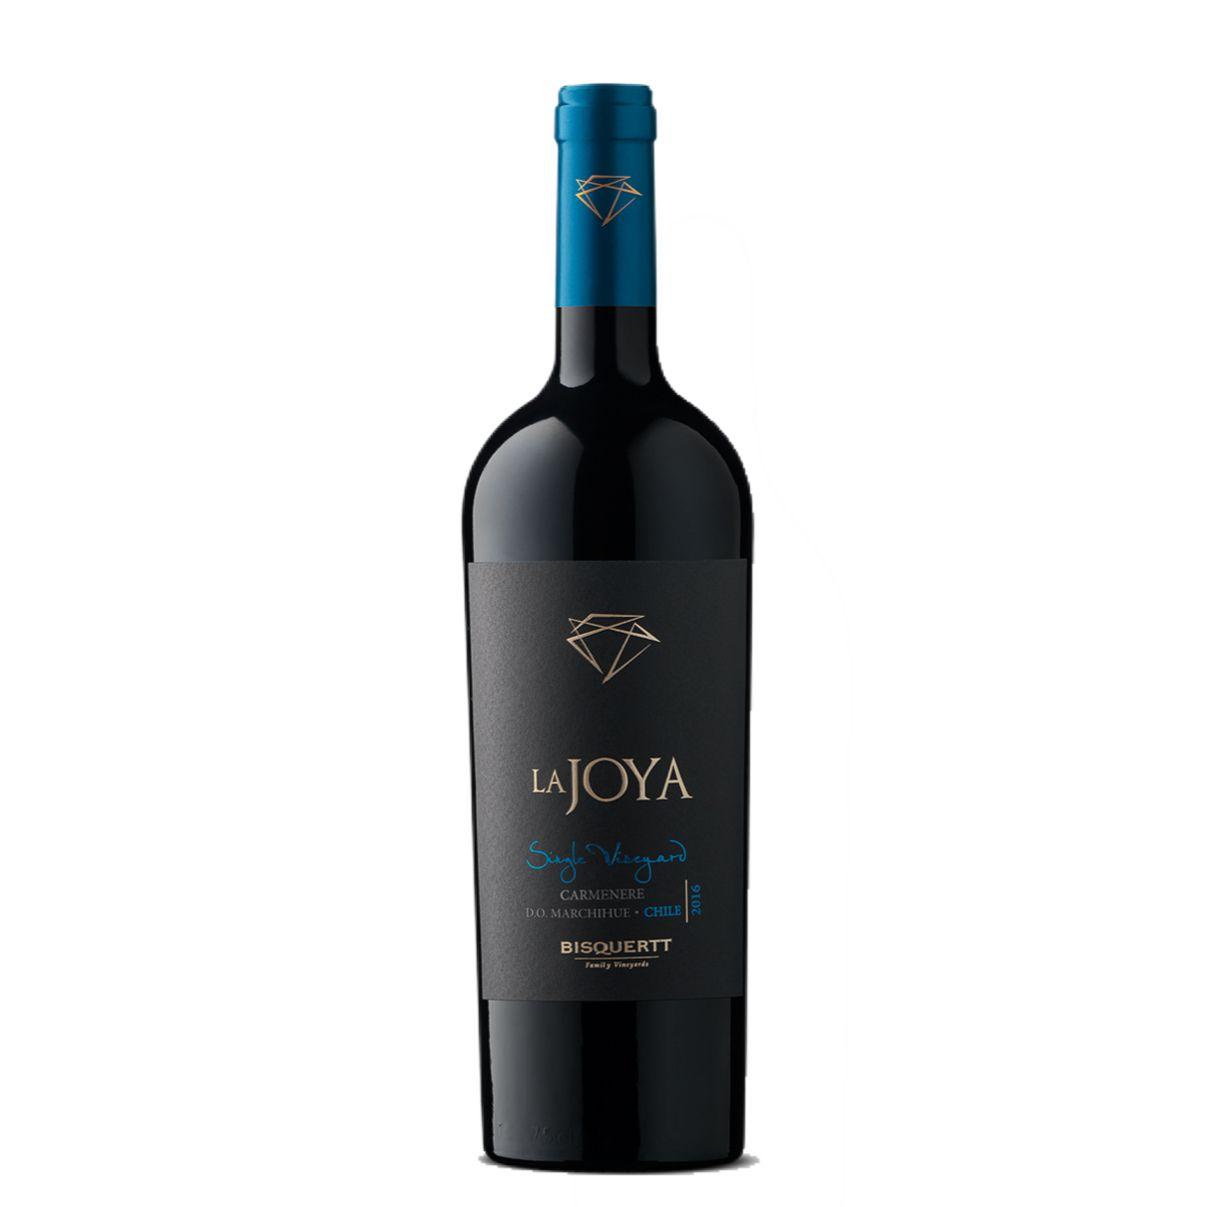 La Joya Single Vineyard Carménère